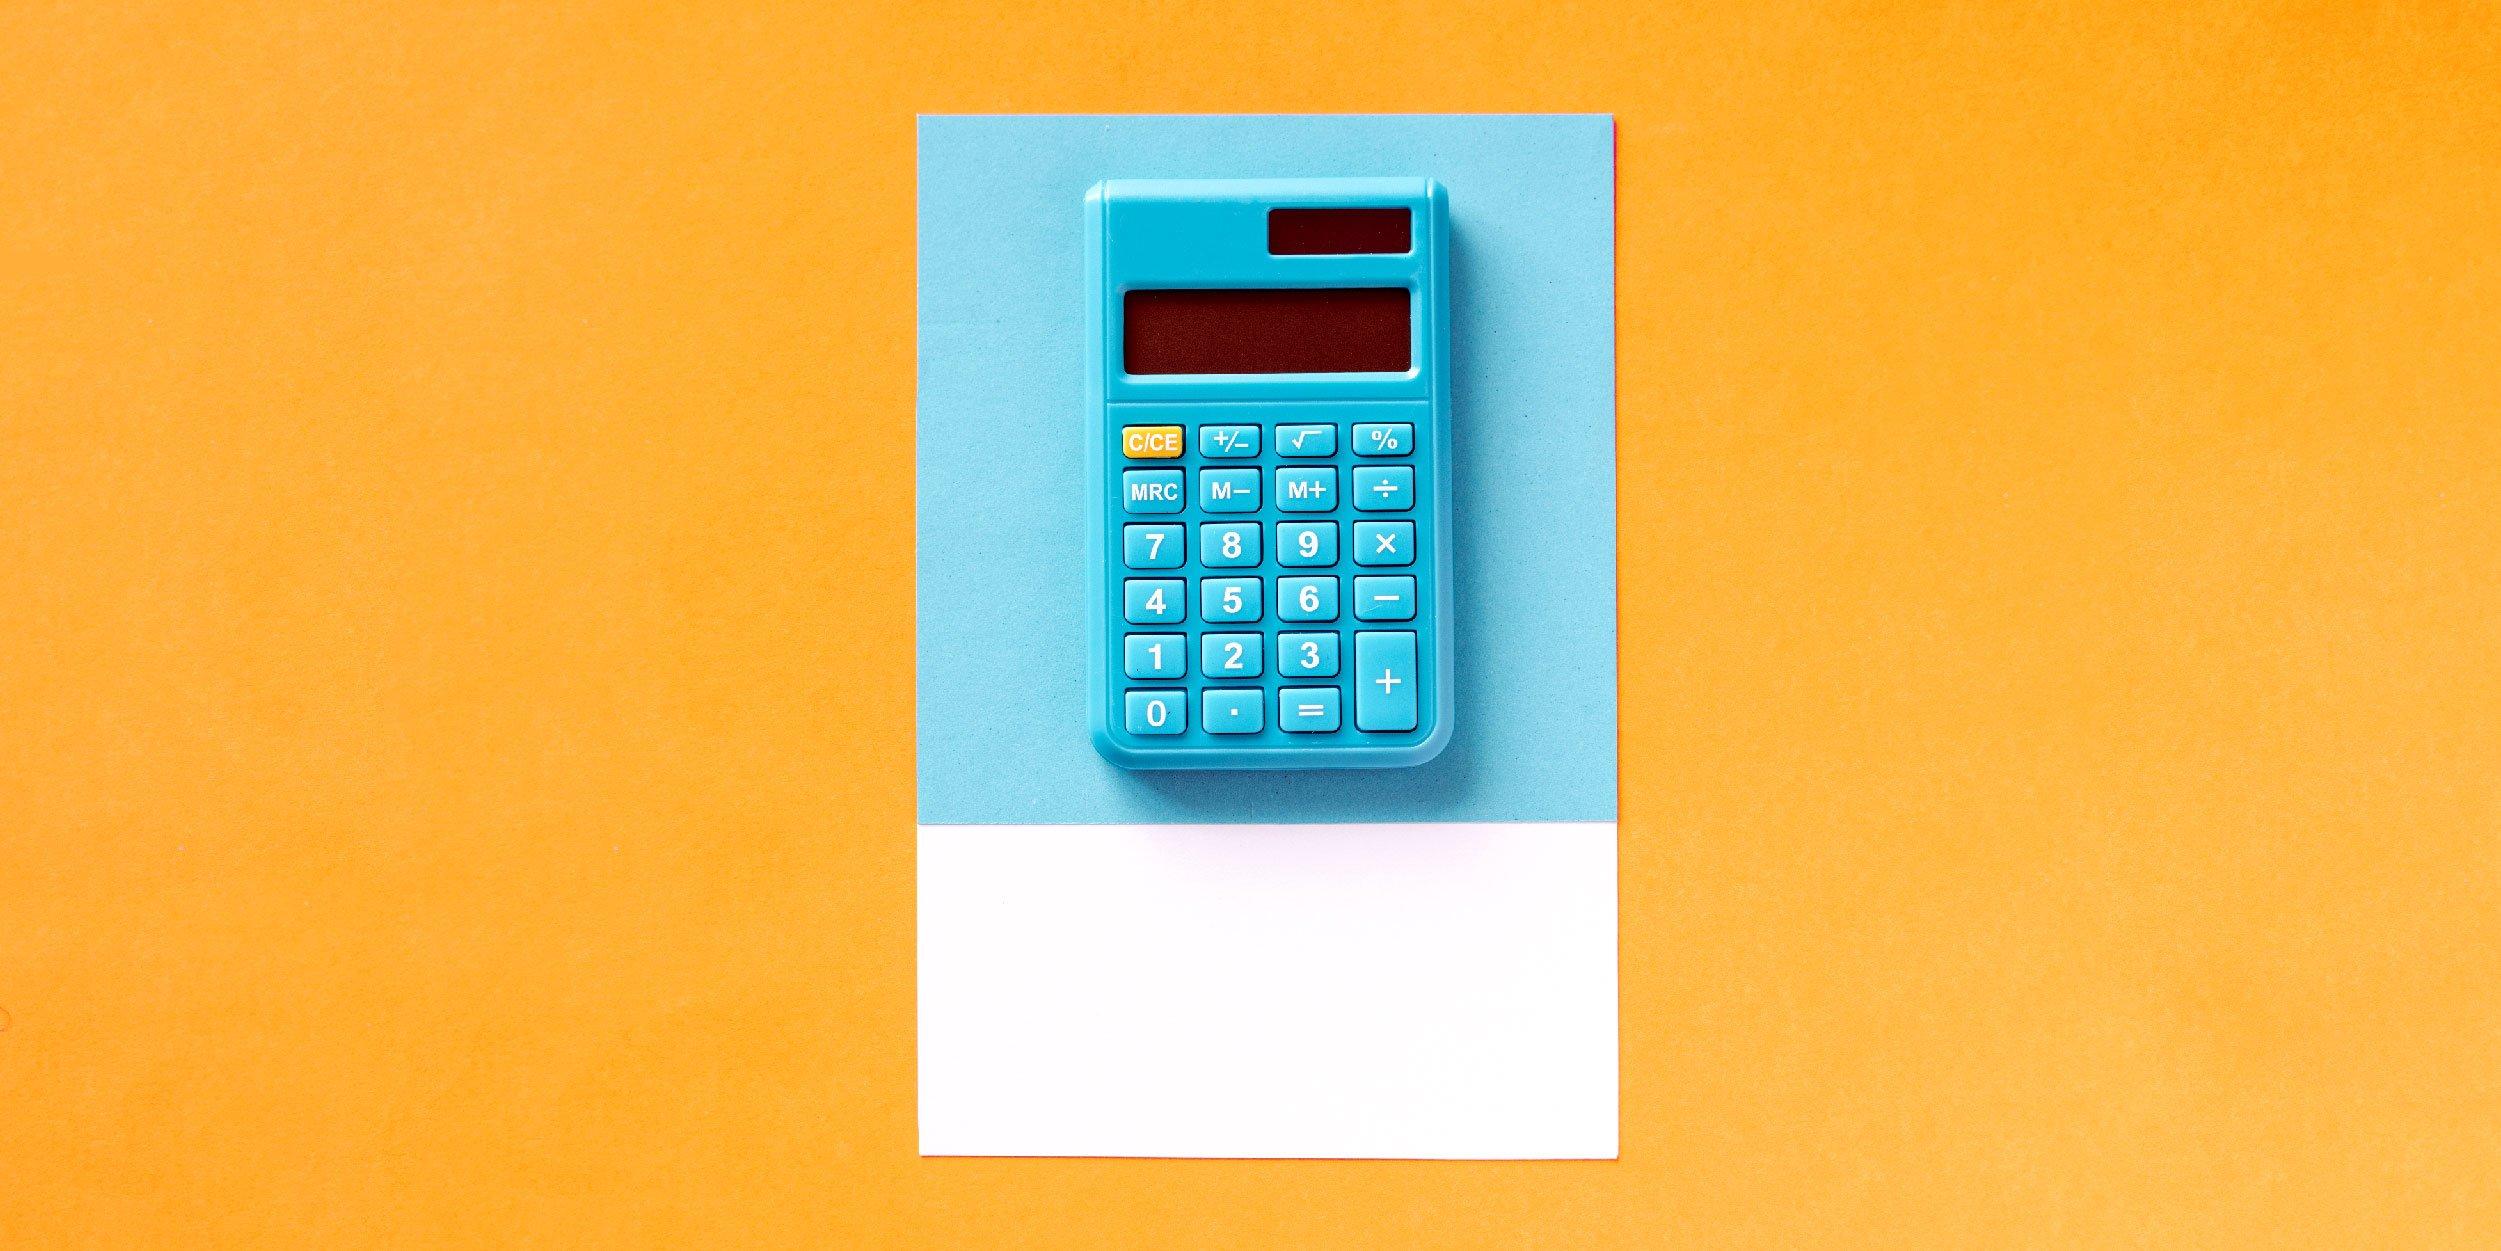 Image of a blue calculator